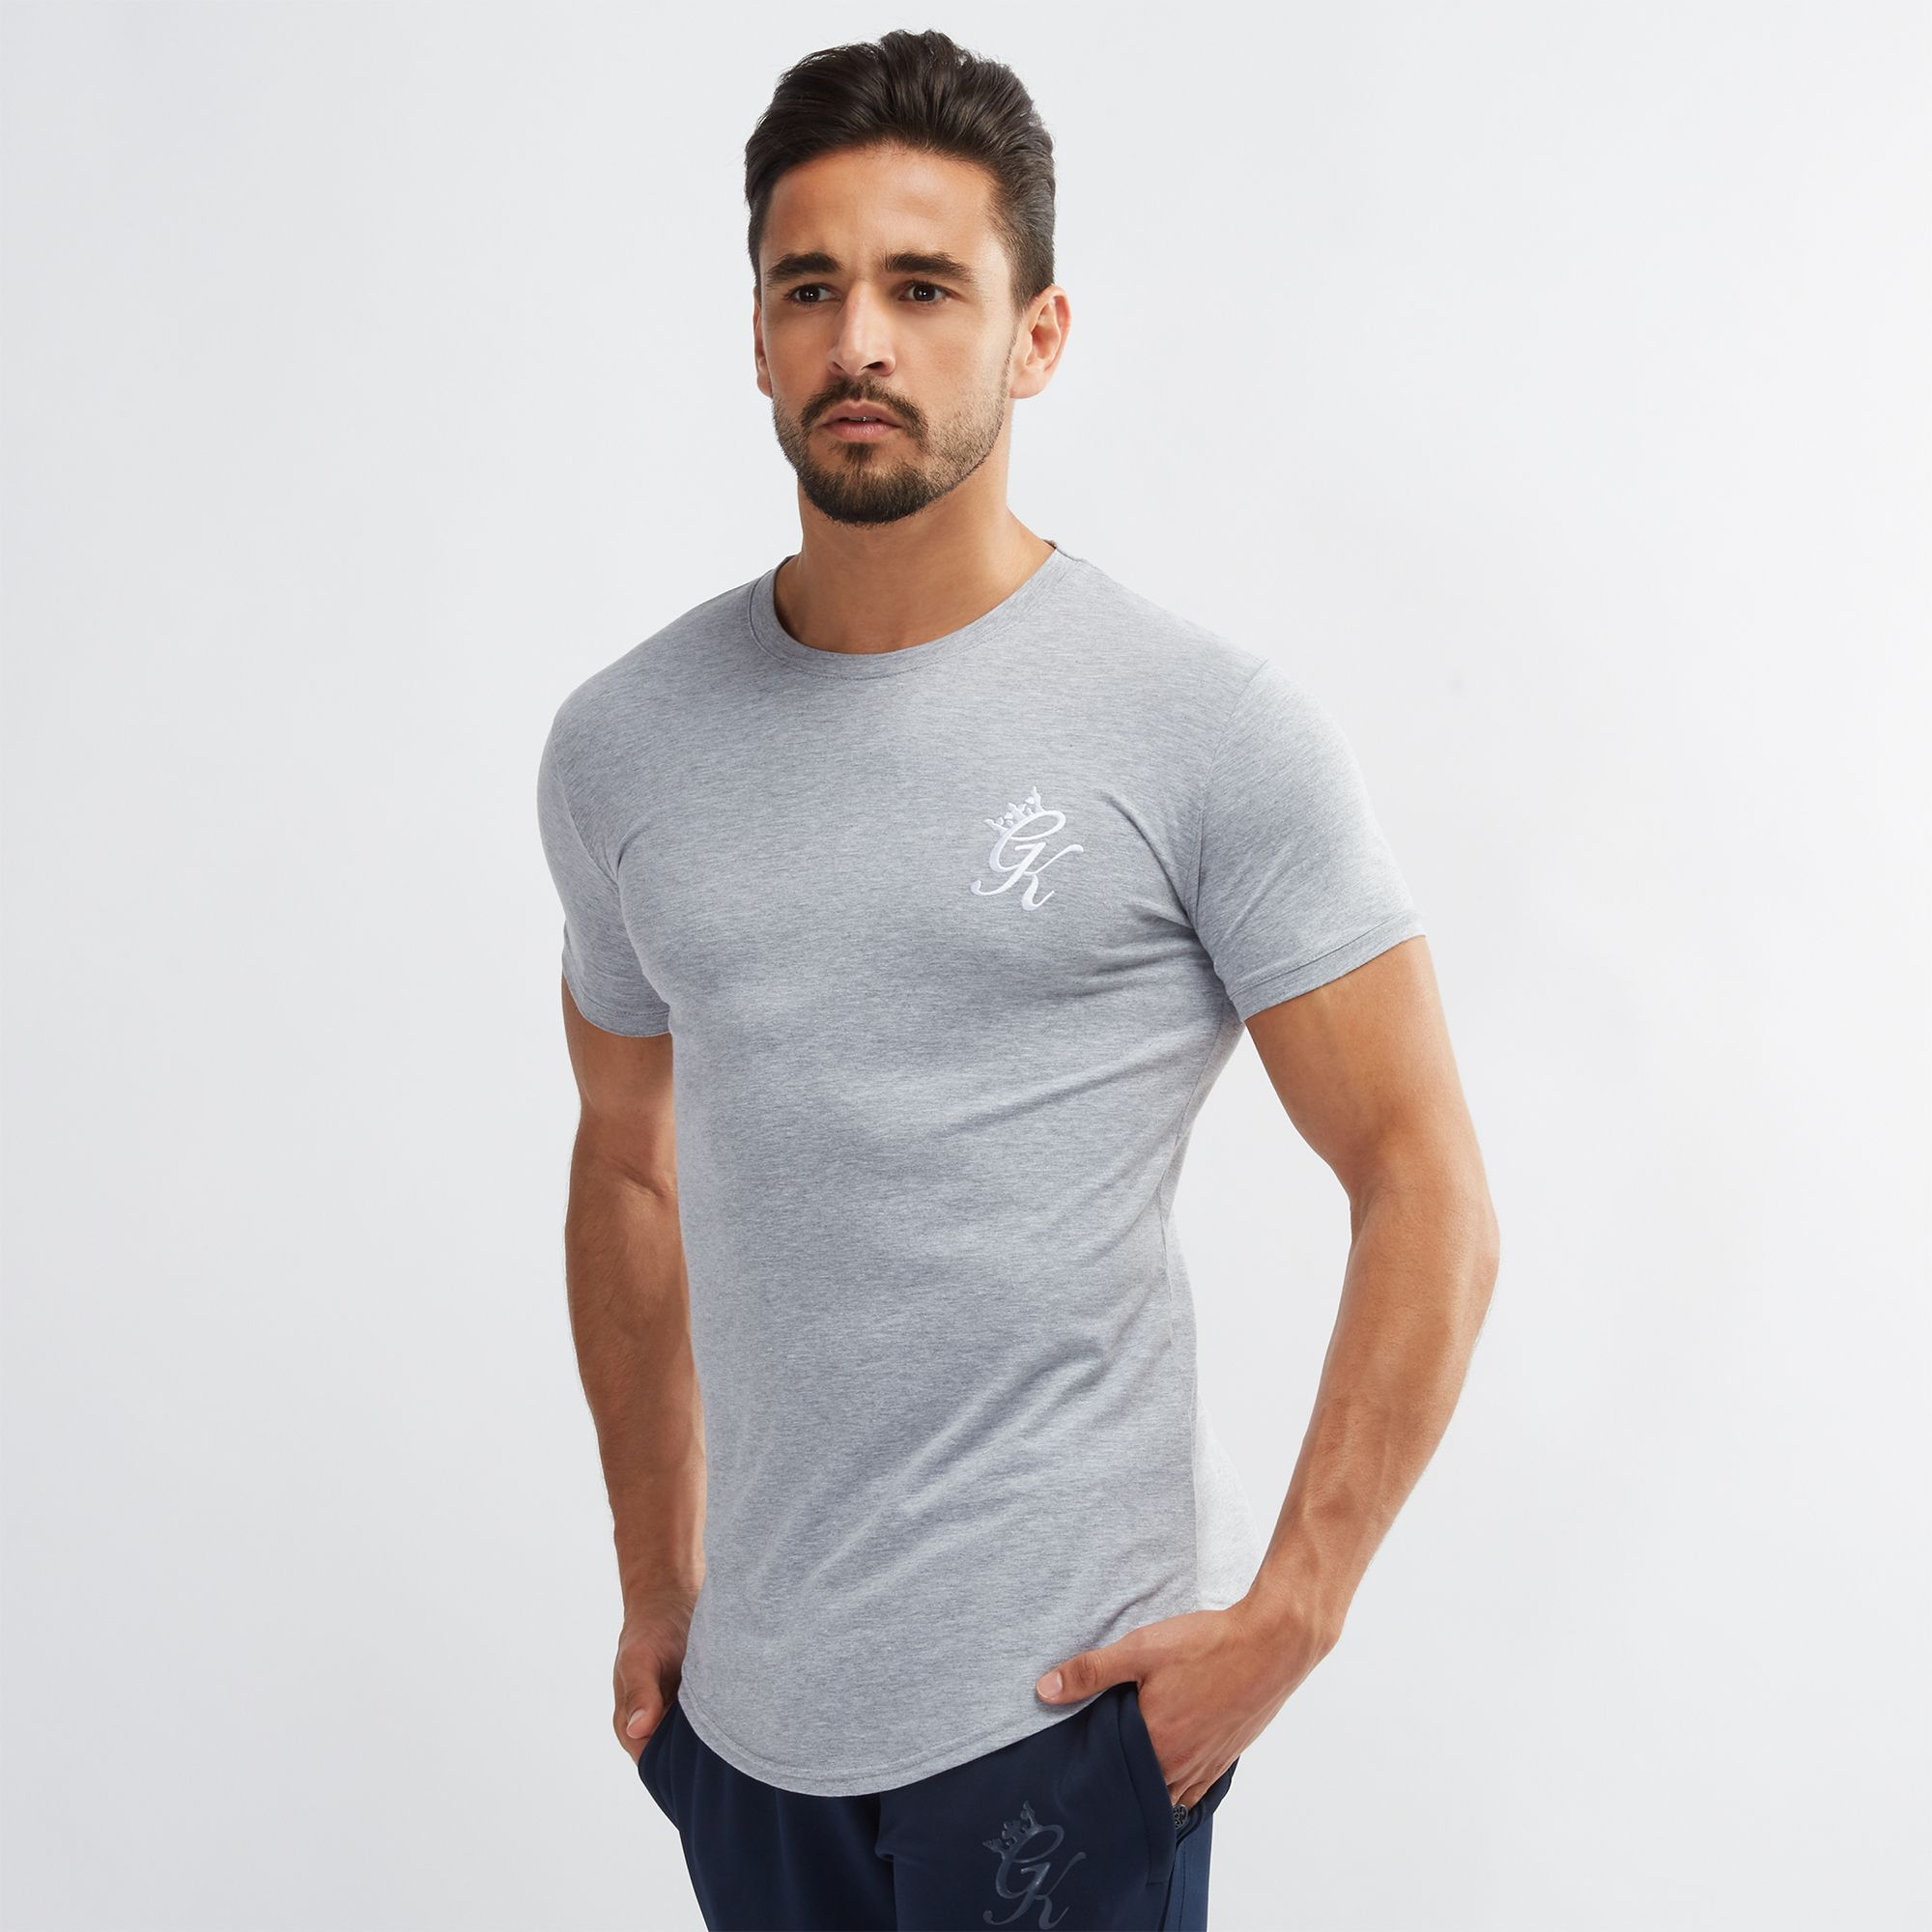 d6a87d332 Mens Gym King T Shirts